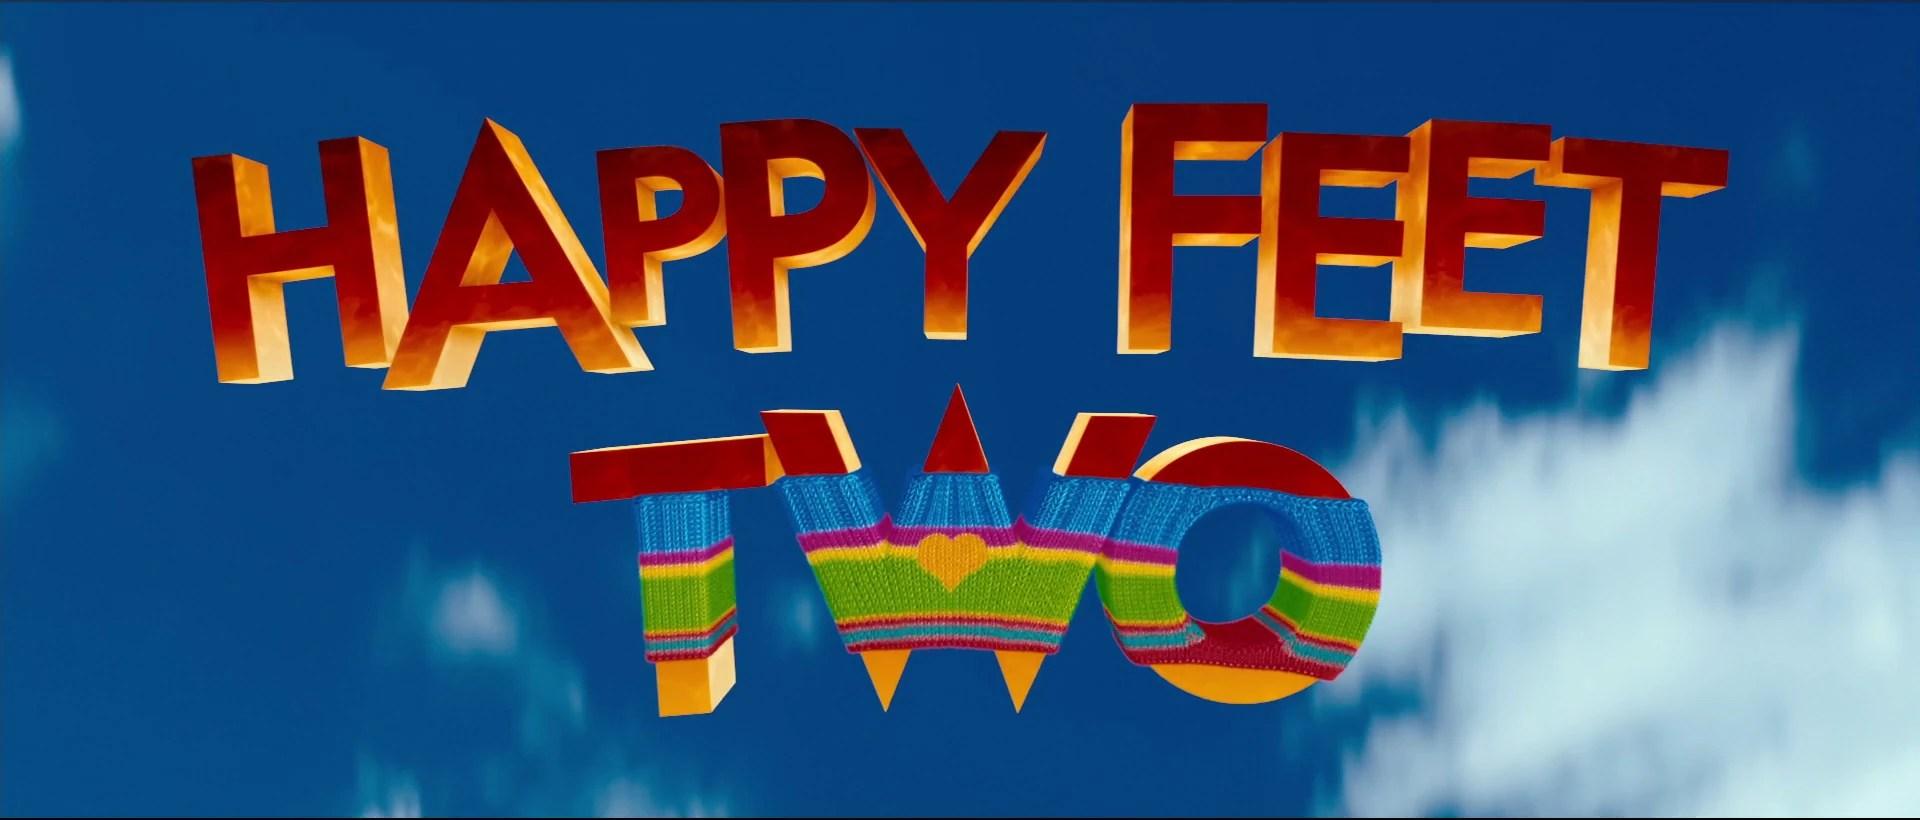 The Opening MedleyGallery Happy Feet Wiki FANDOM Powered By Wikia